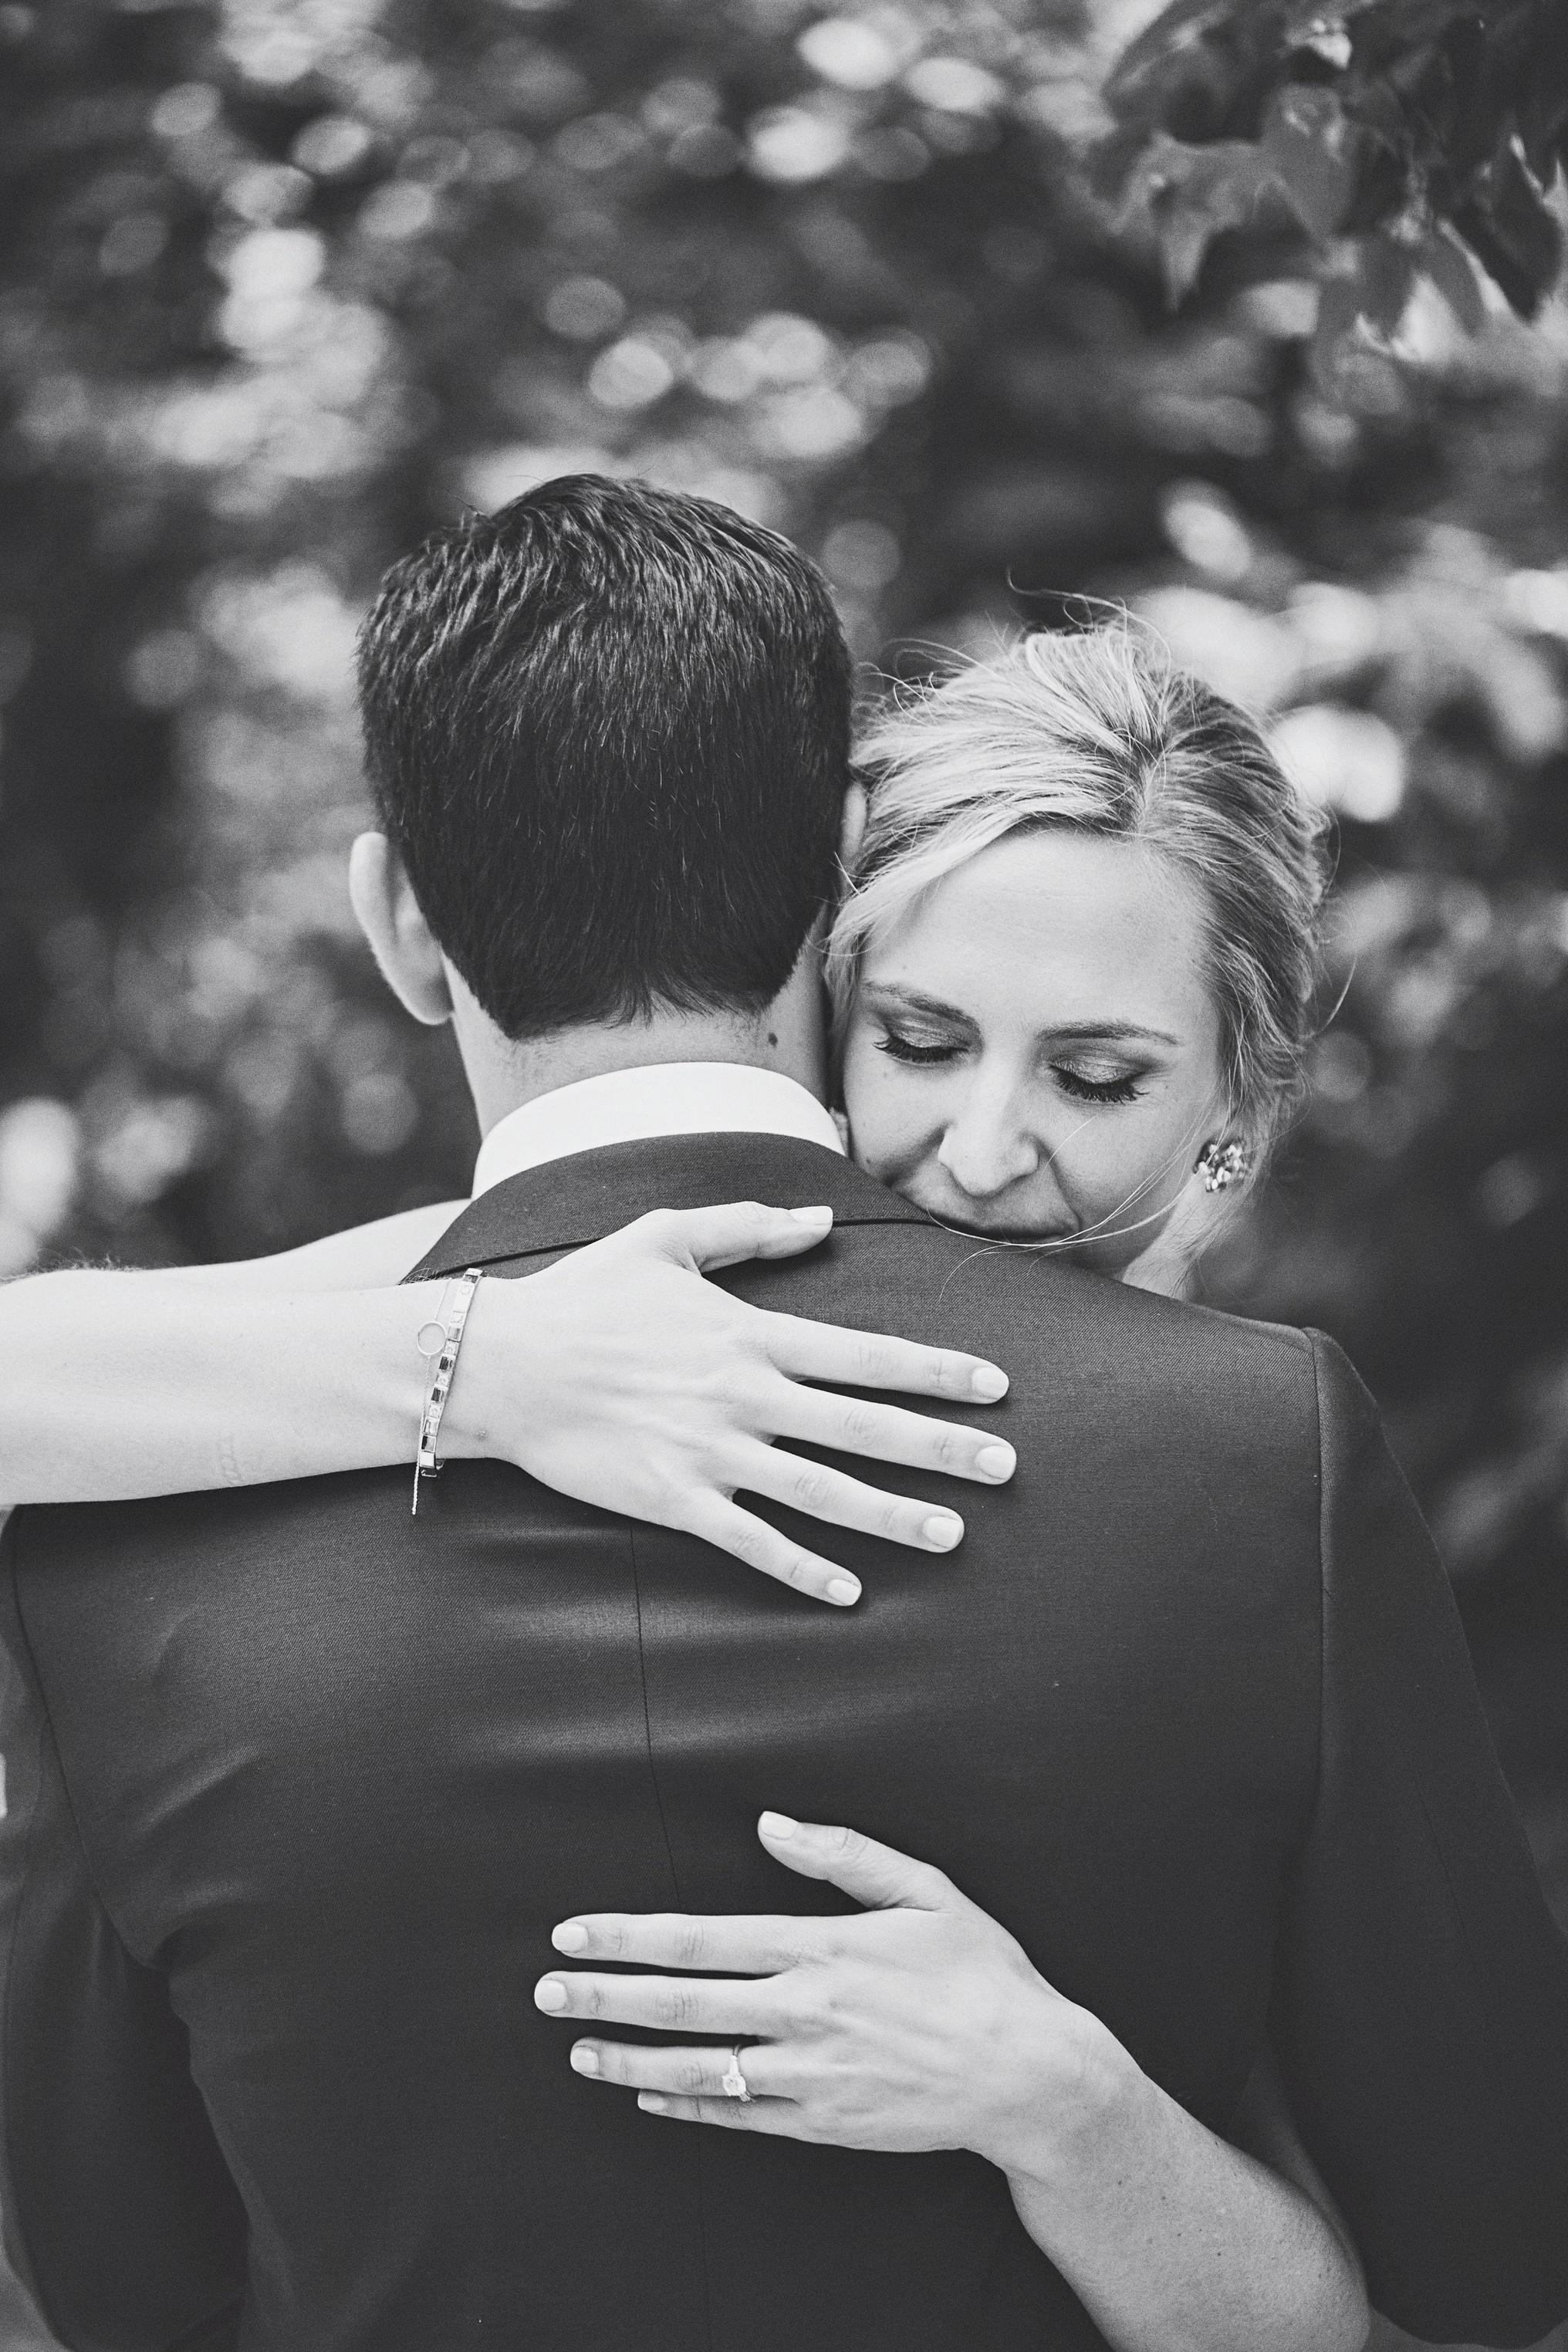 best_wedding_photography_2017_by_lucas_botz_photography_162.jpg